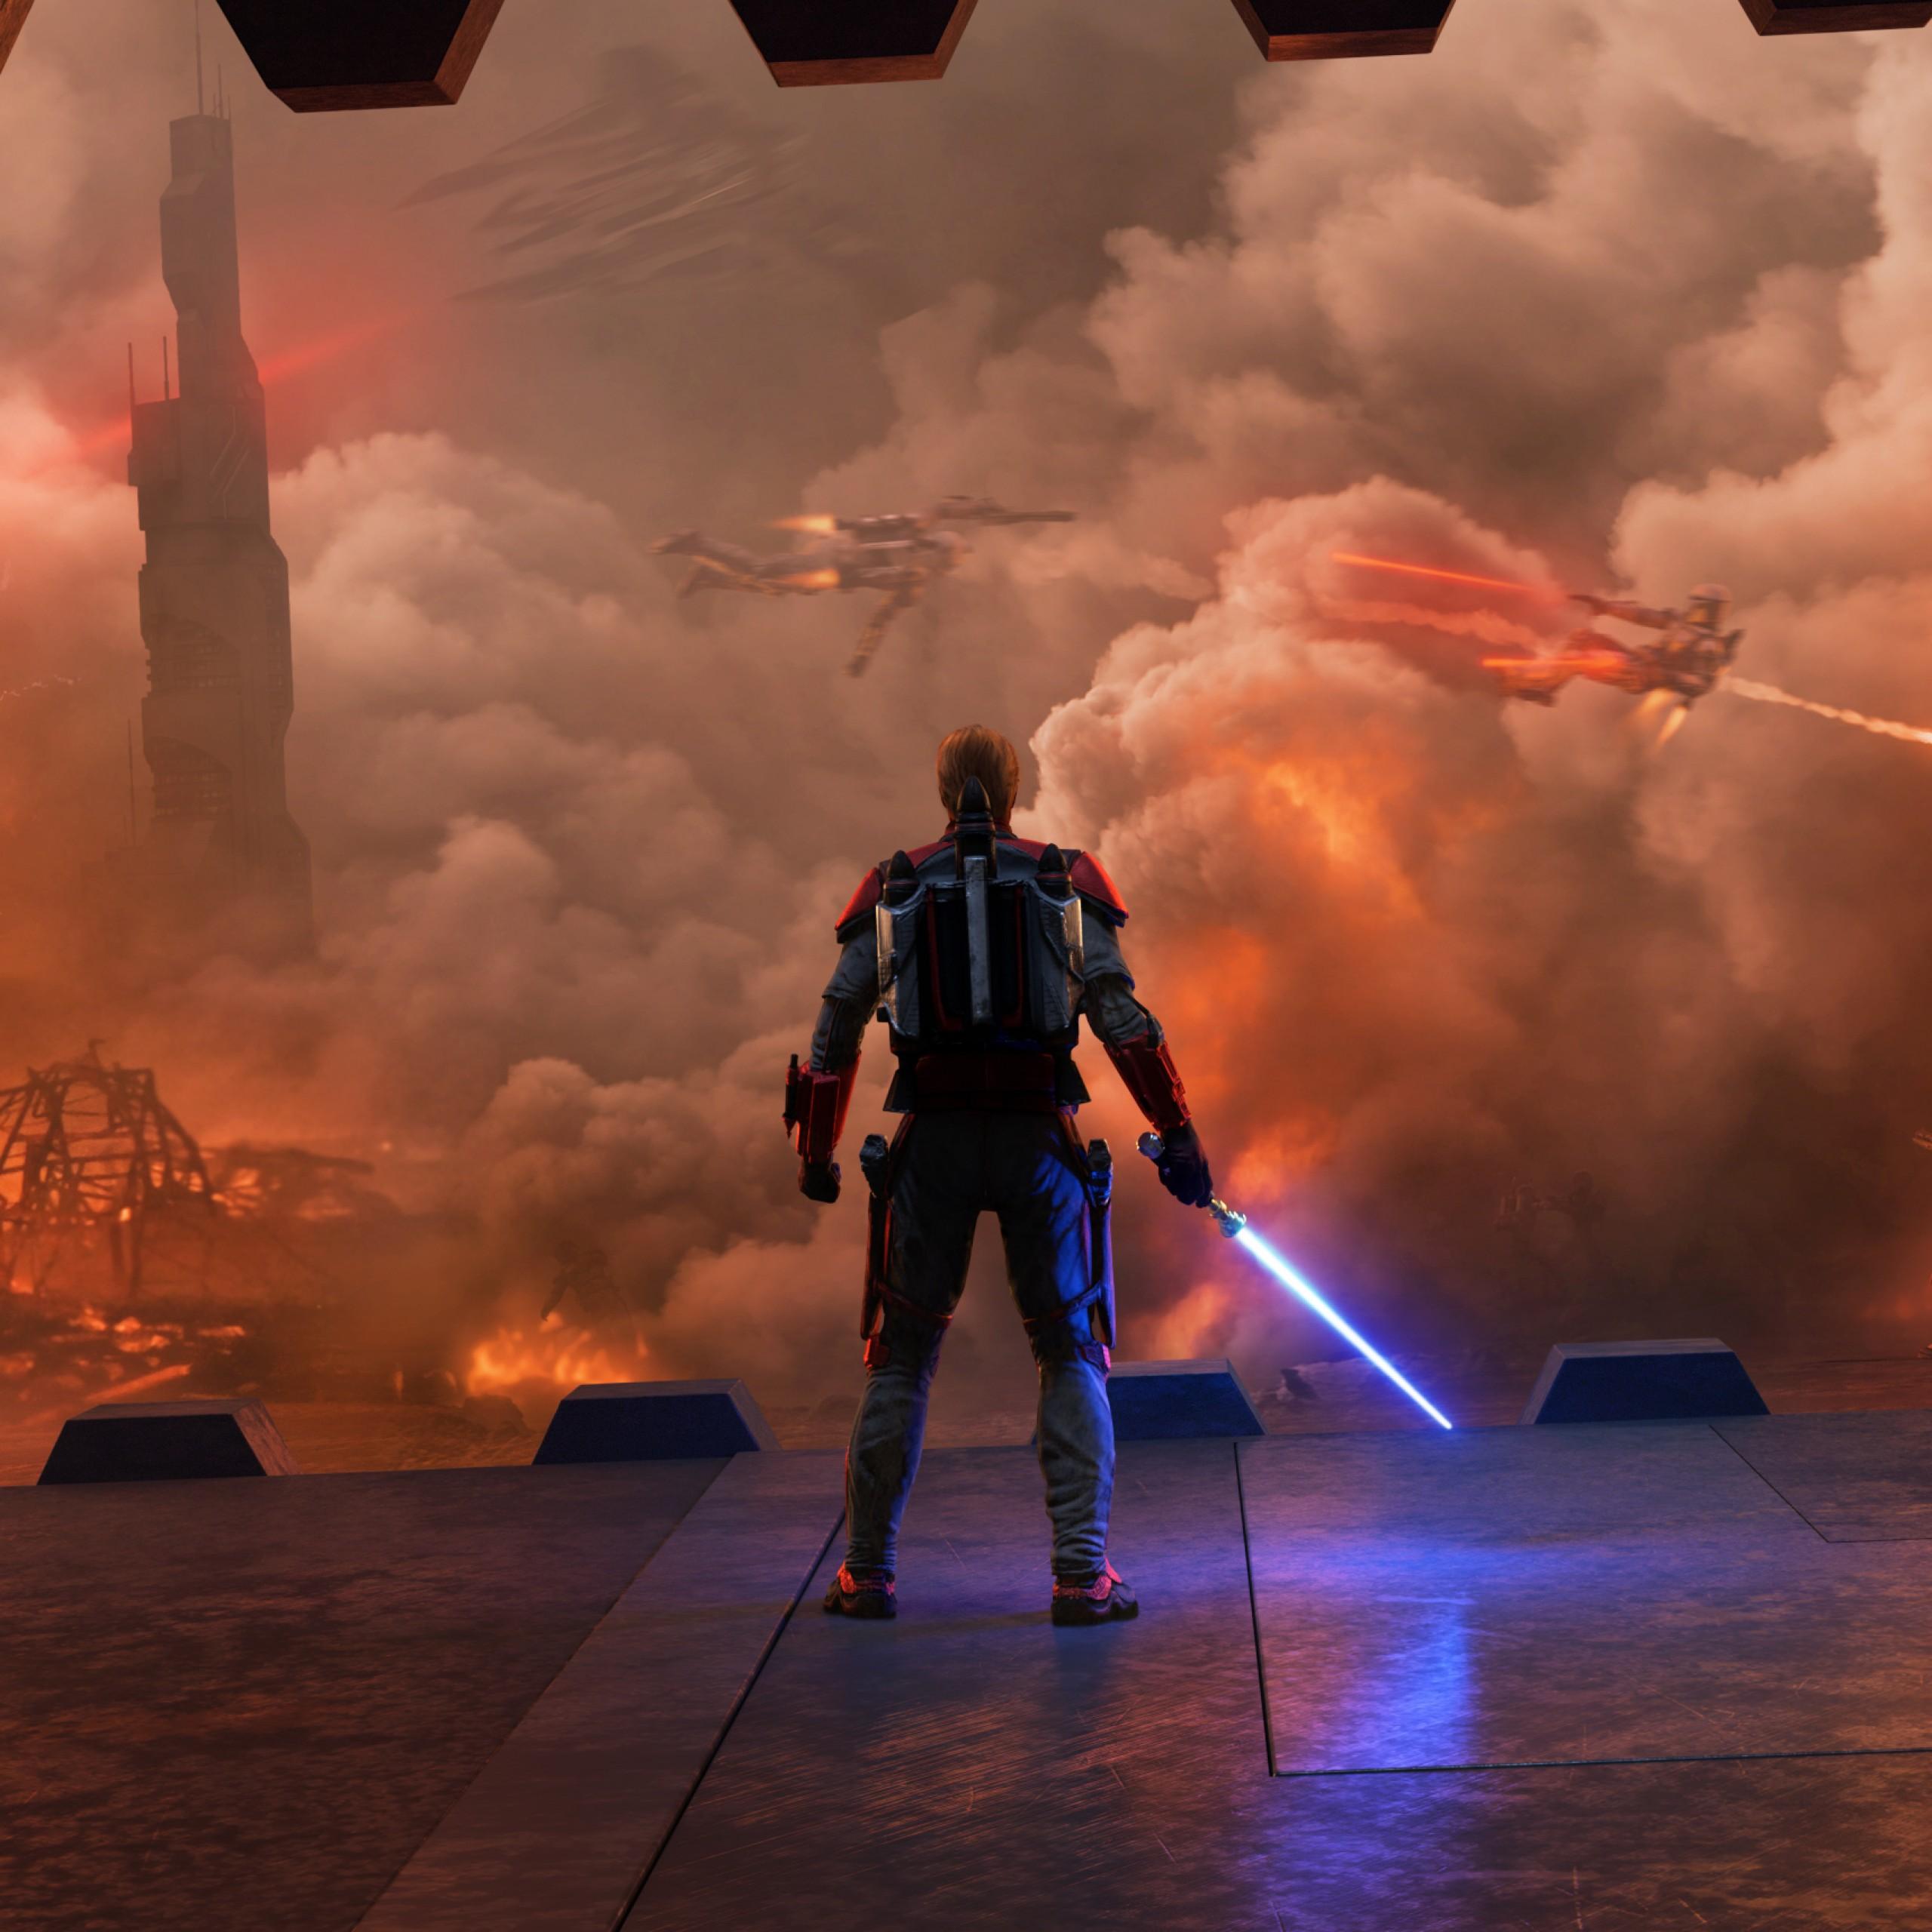 Obi Wan Kenobi Wallpaper Hd Posted By Sarah Tremblay